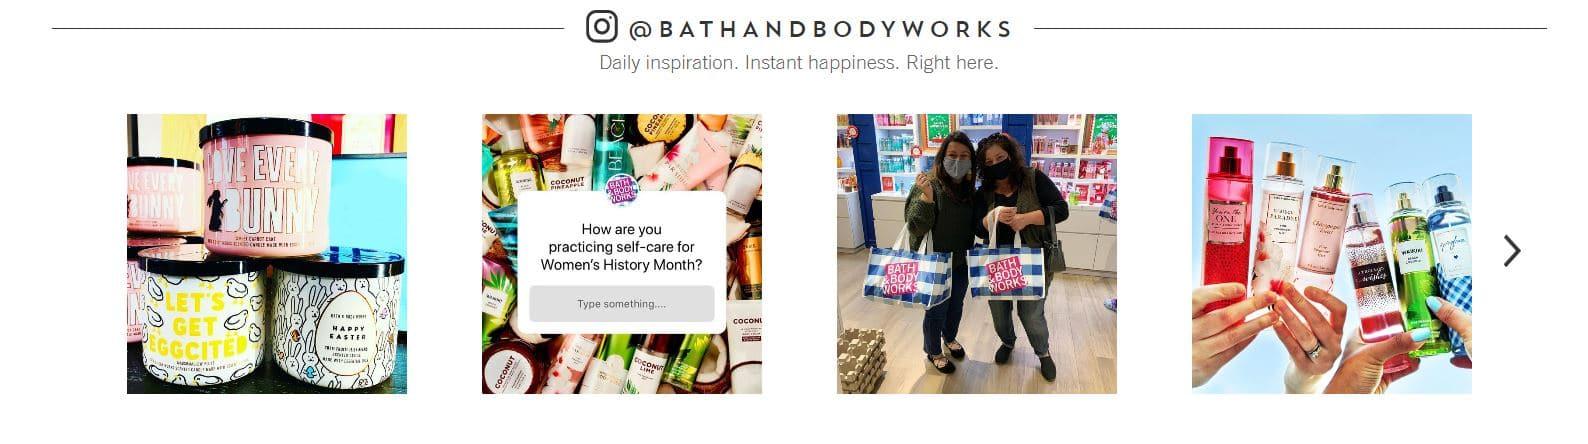 Bath and Body Works - Instagram Gallery